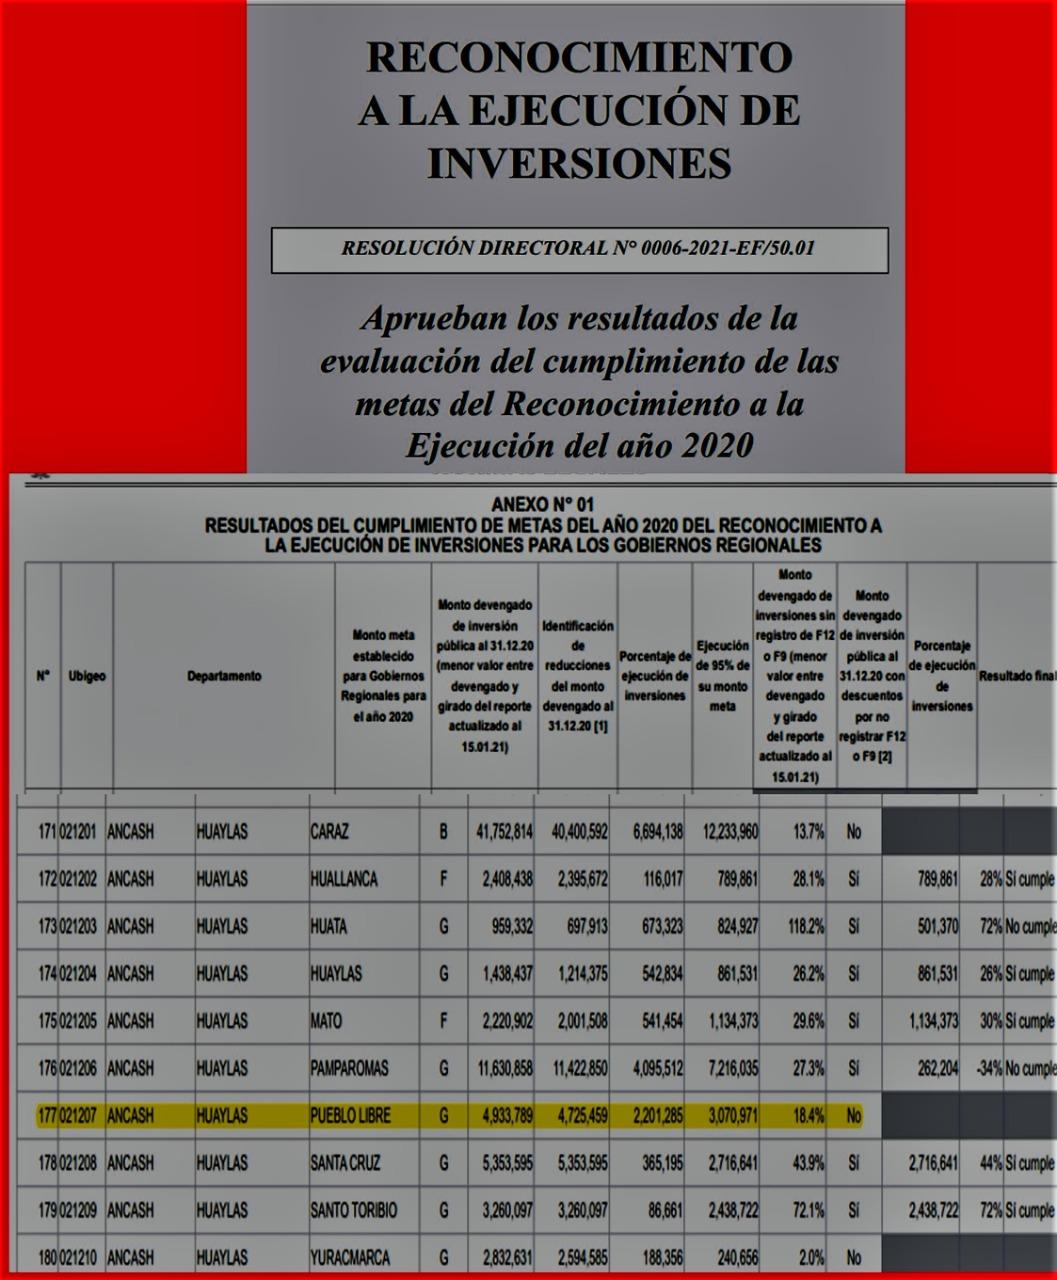 PESIMO RESULTADO DE CUMPLIMINETO DE METAS  PROVINCIA DE HUAYLAS